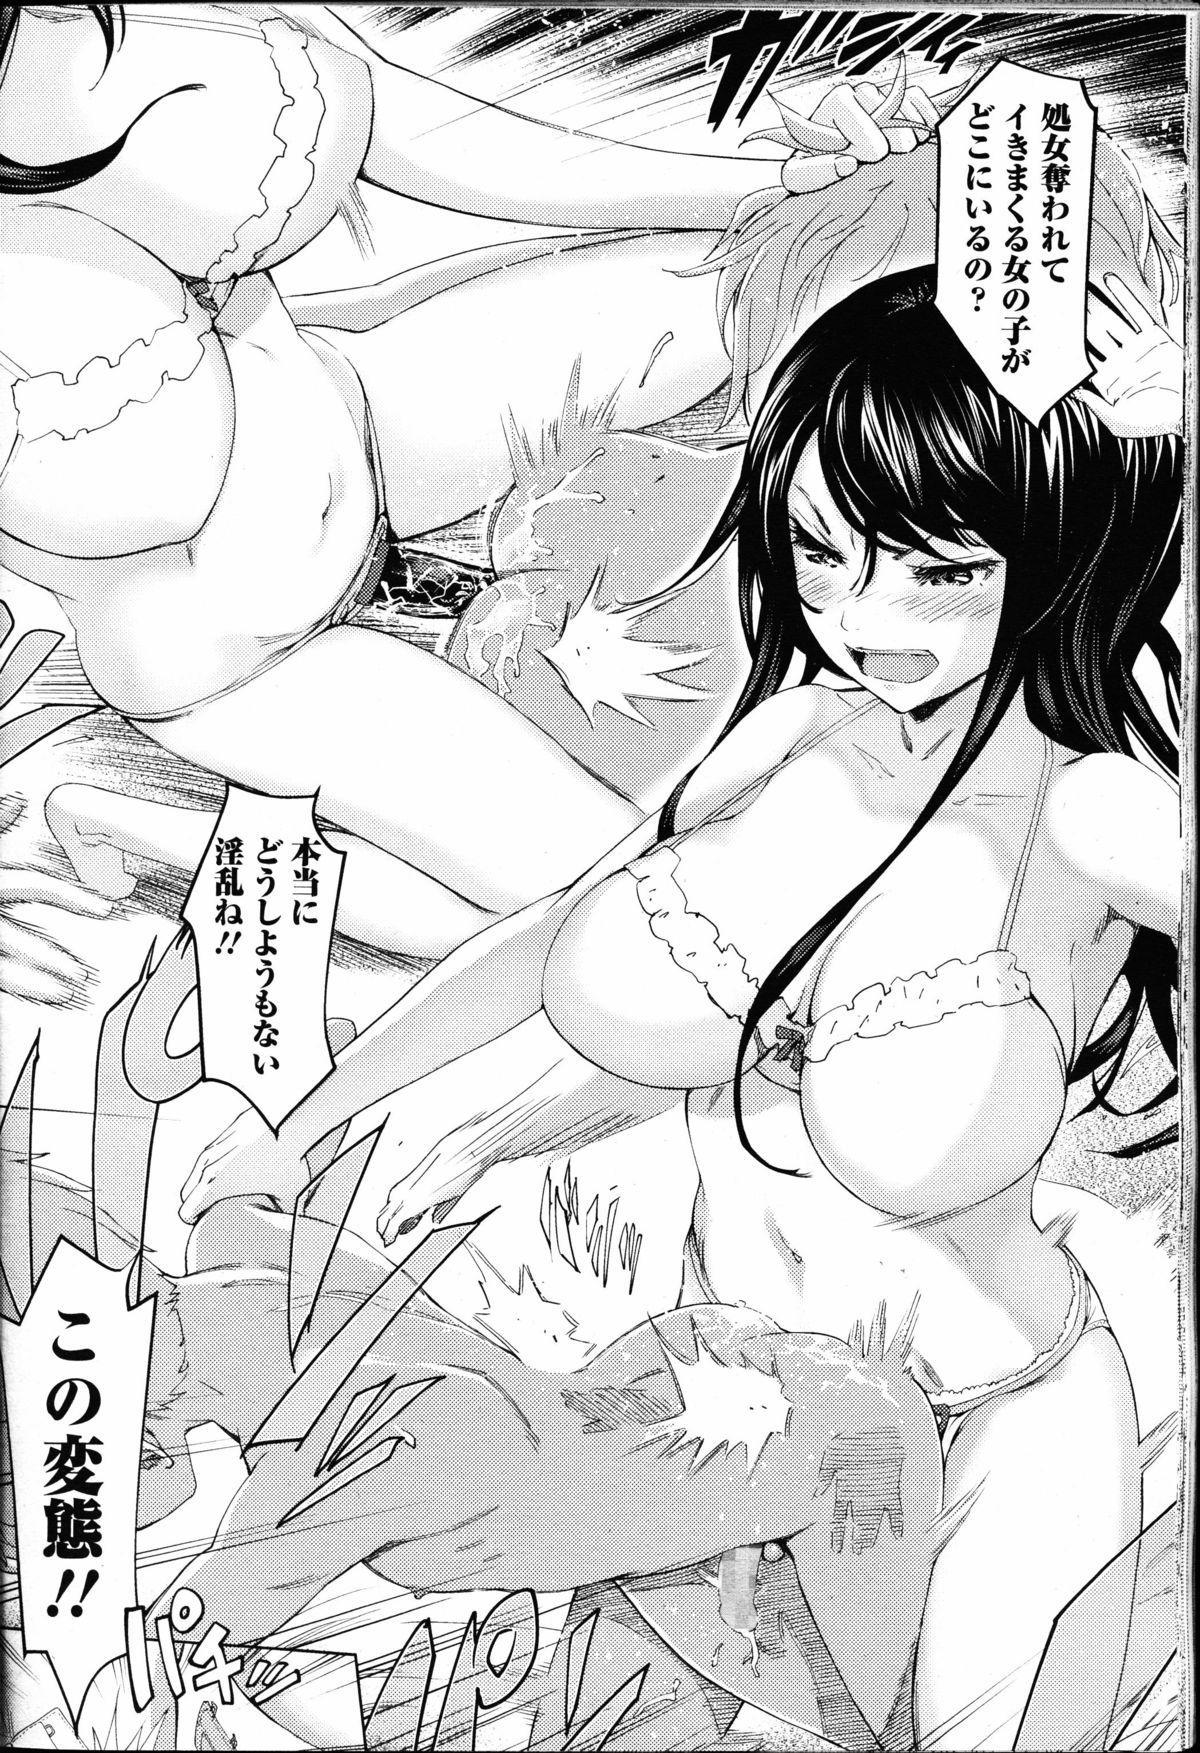 Girls forM Vol. 09 165